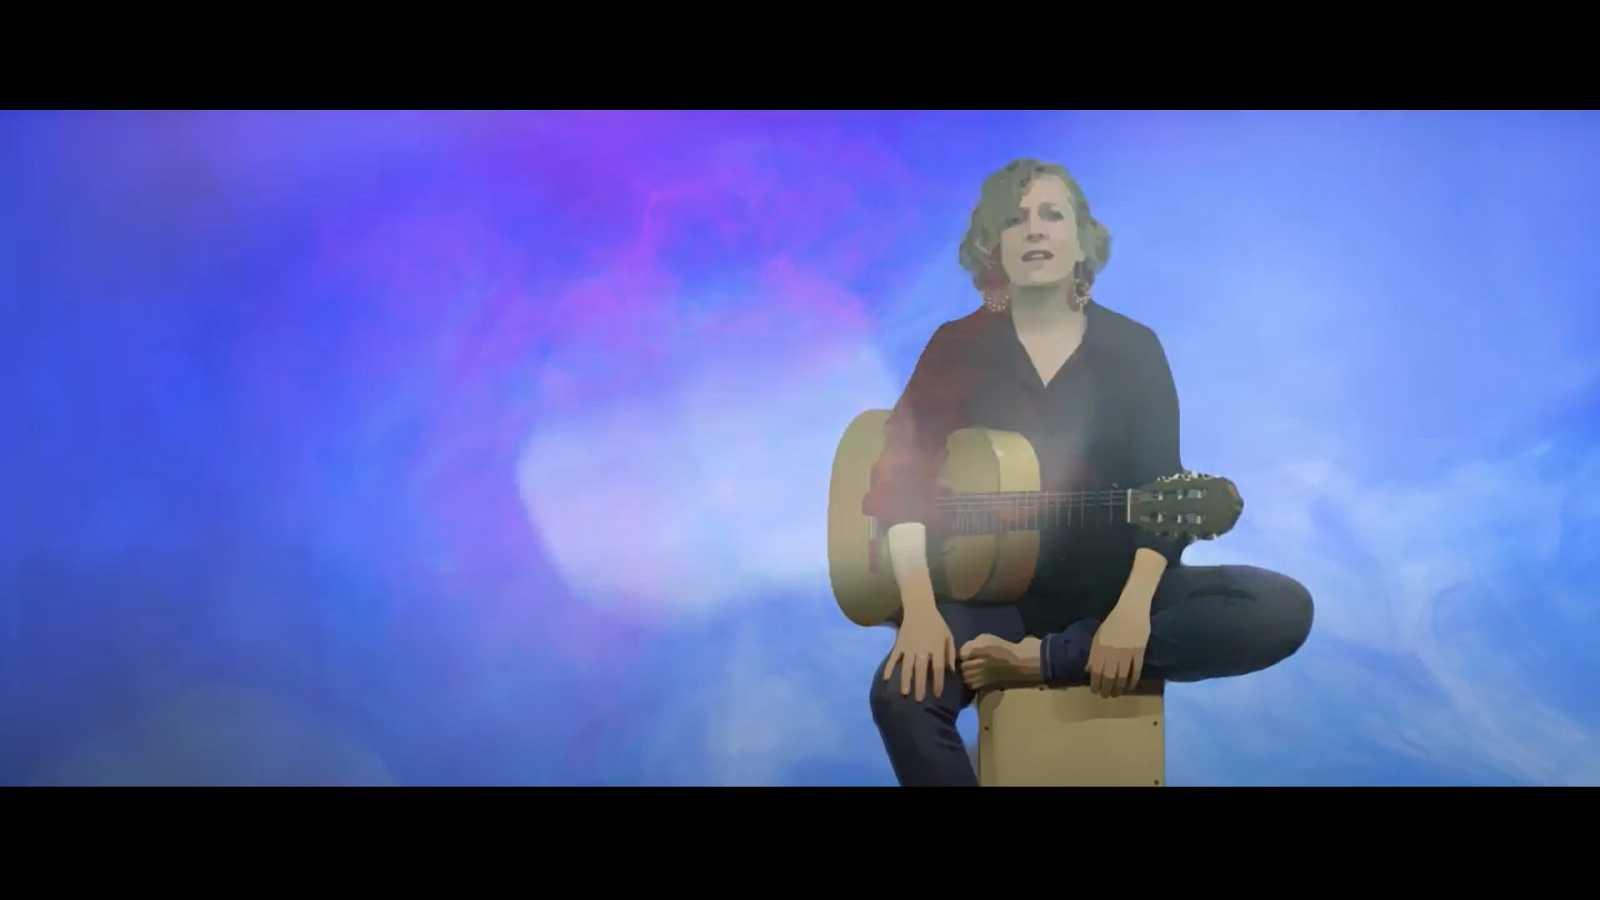 La LiBéLuLa - Inercia (de la ceguera) (La Niña del Cabo) - 11/06/20 - escuchar ahora